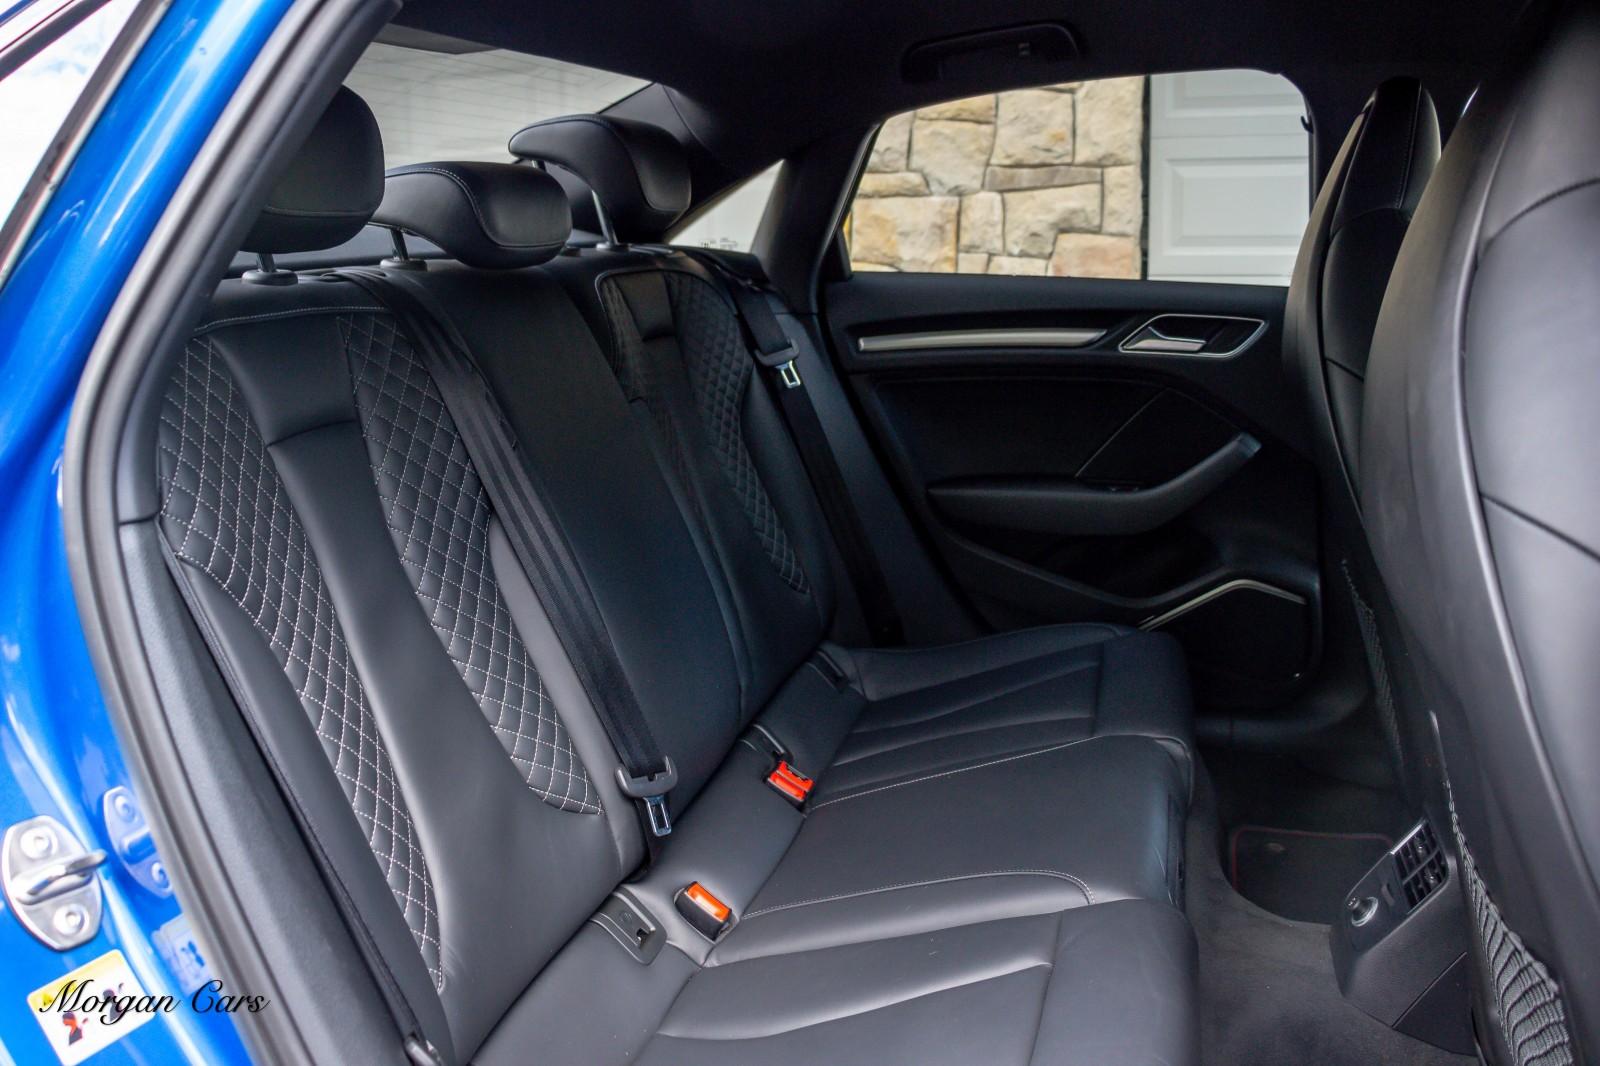 2017 Audi A3 S3 2.0 TFSI QUATTRO BLACK EDITION Petrol Semi Auto – Morgan Cars 9 Mound Road, Warrenpoint, Newry BT34 3LW, UK full